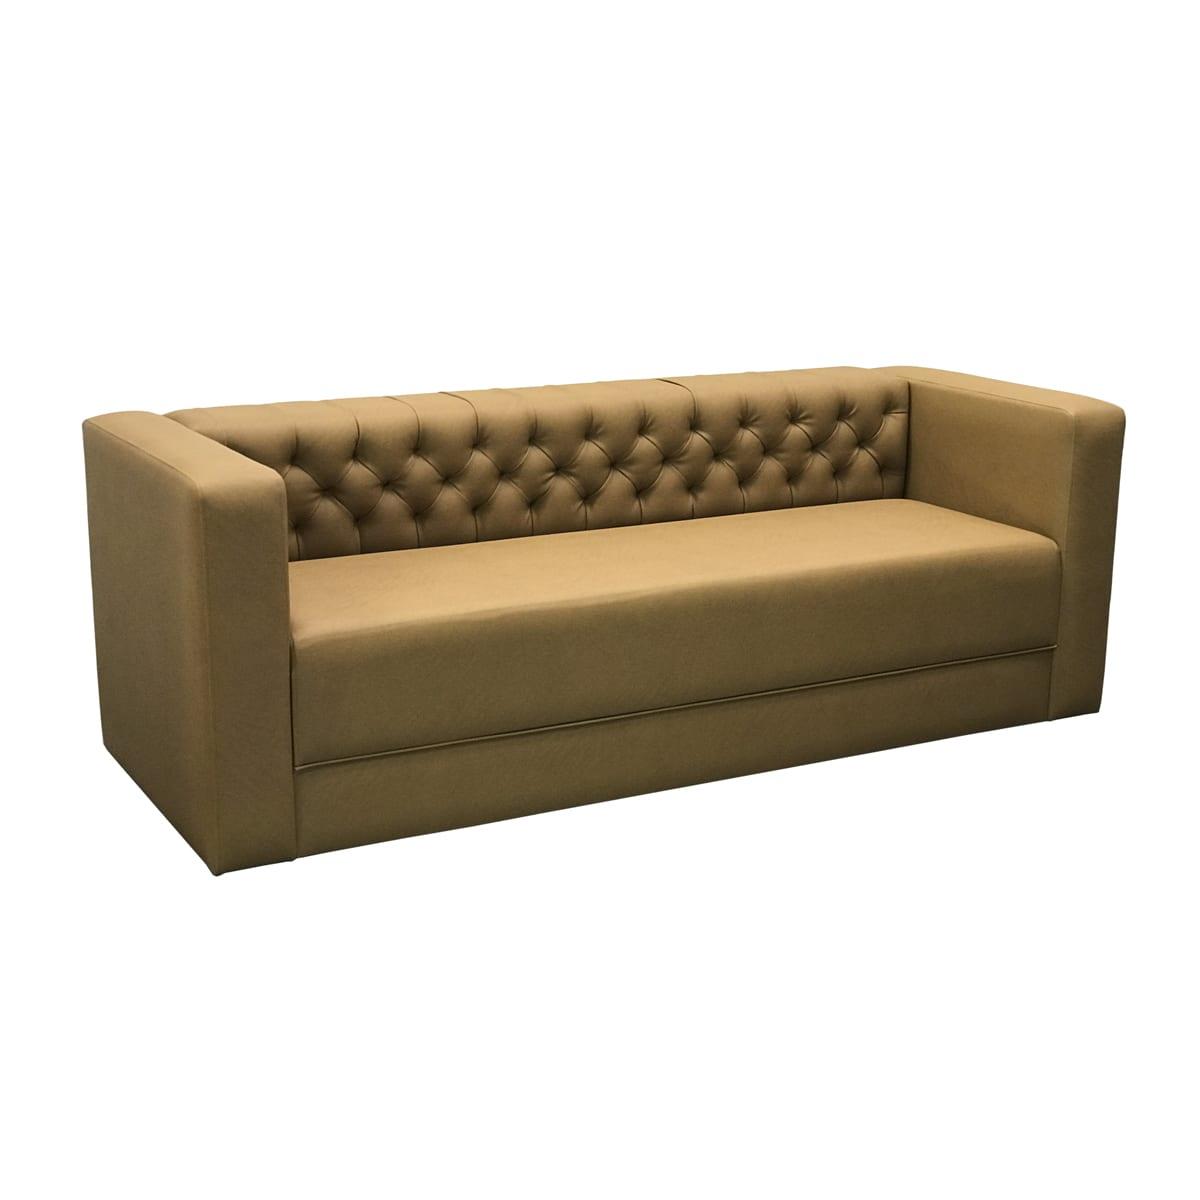 Lincoln Park Sofa